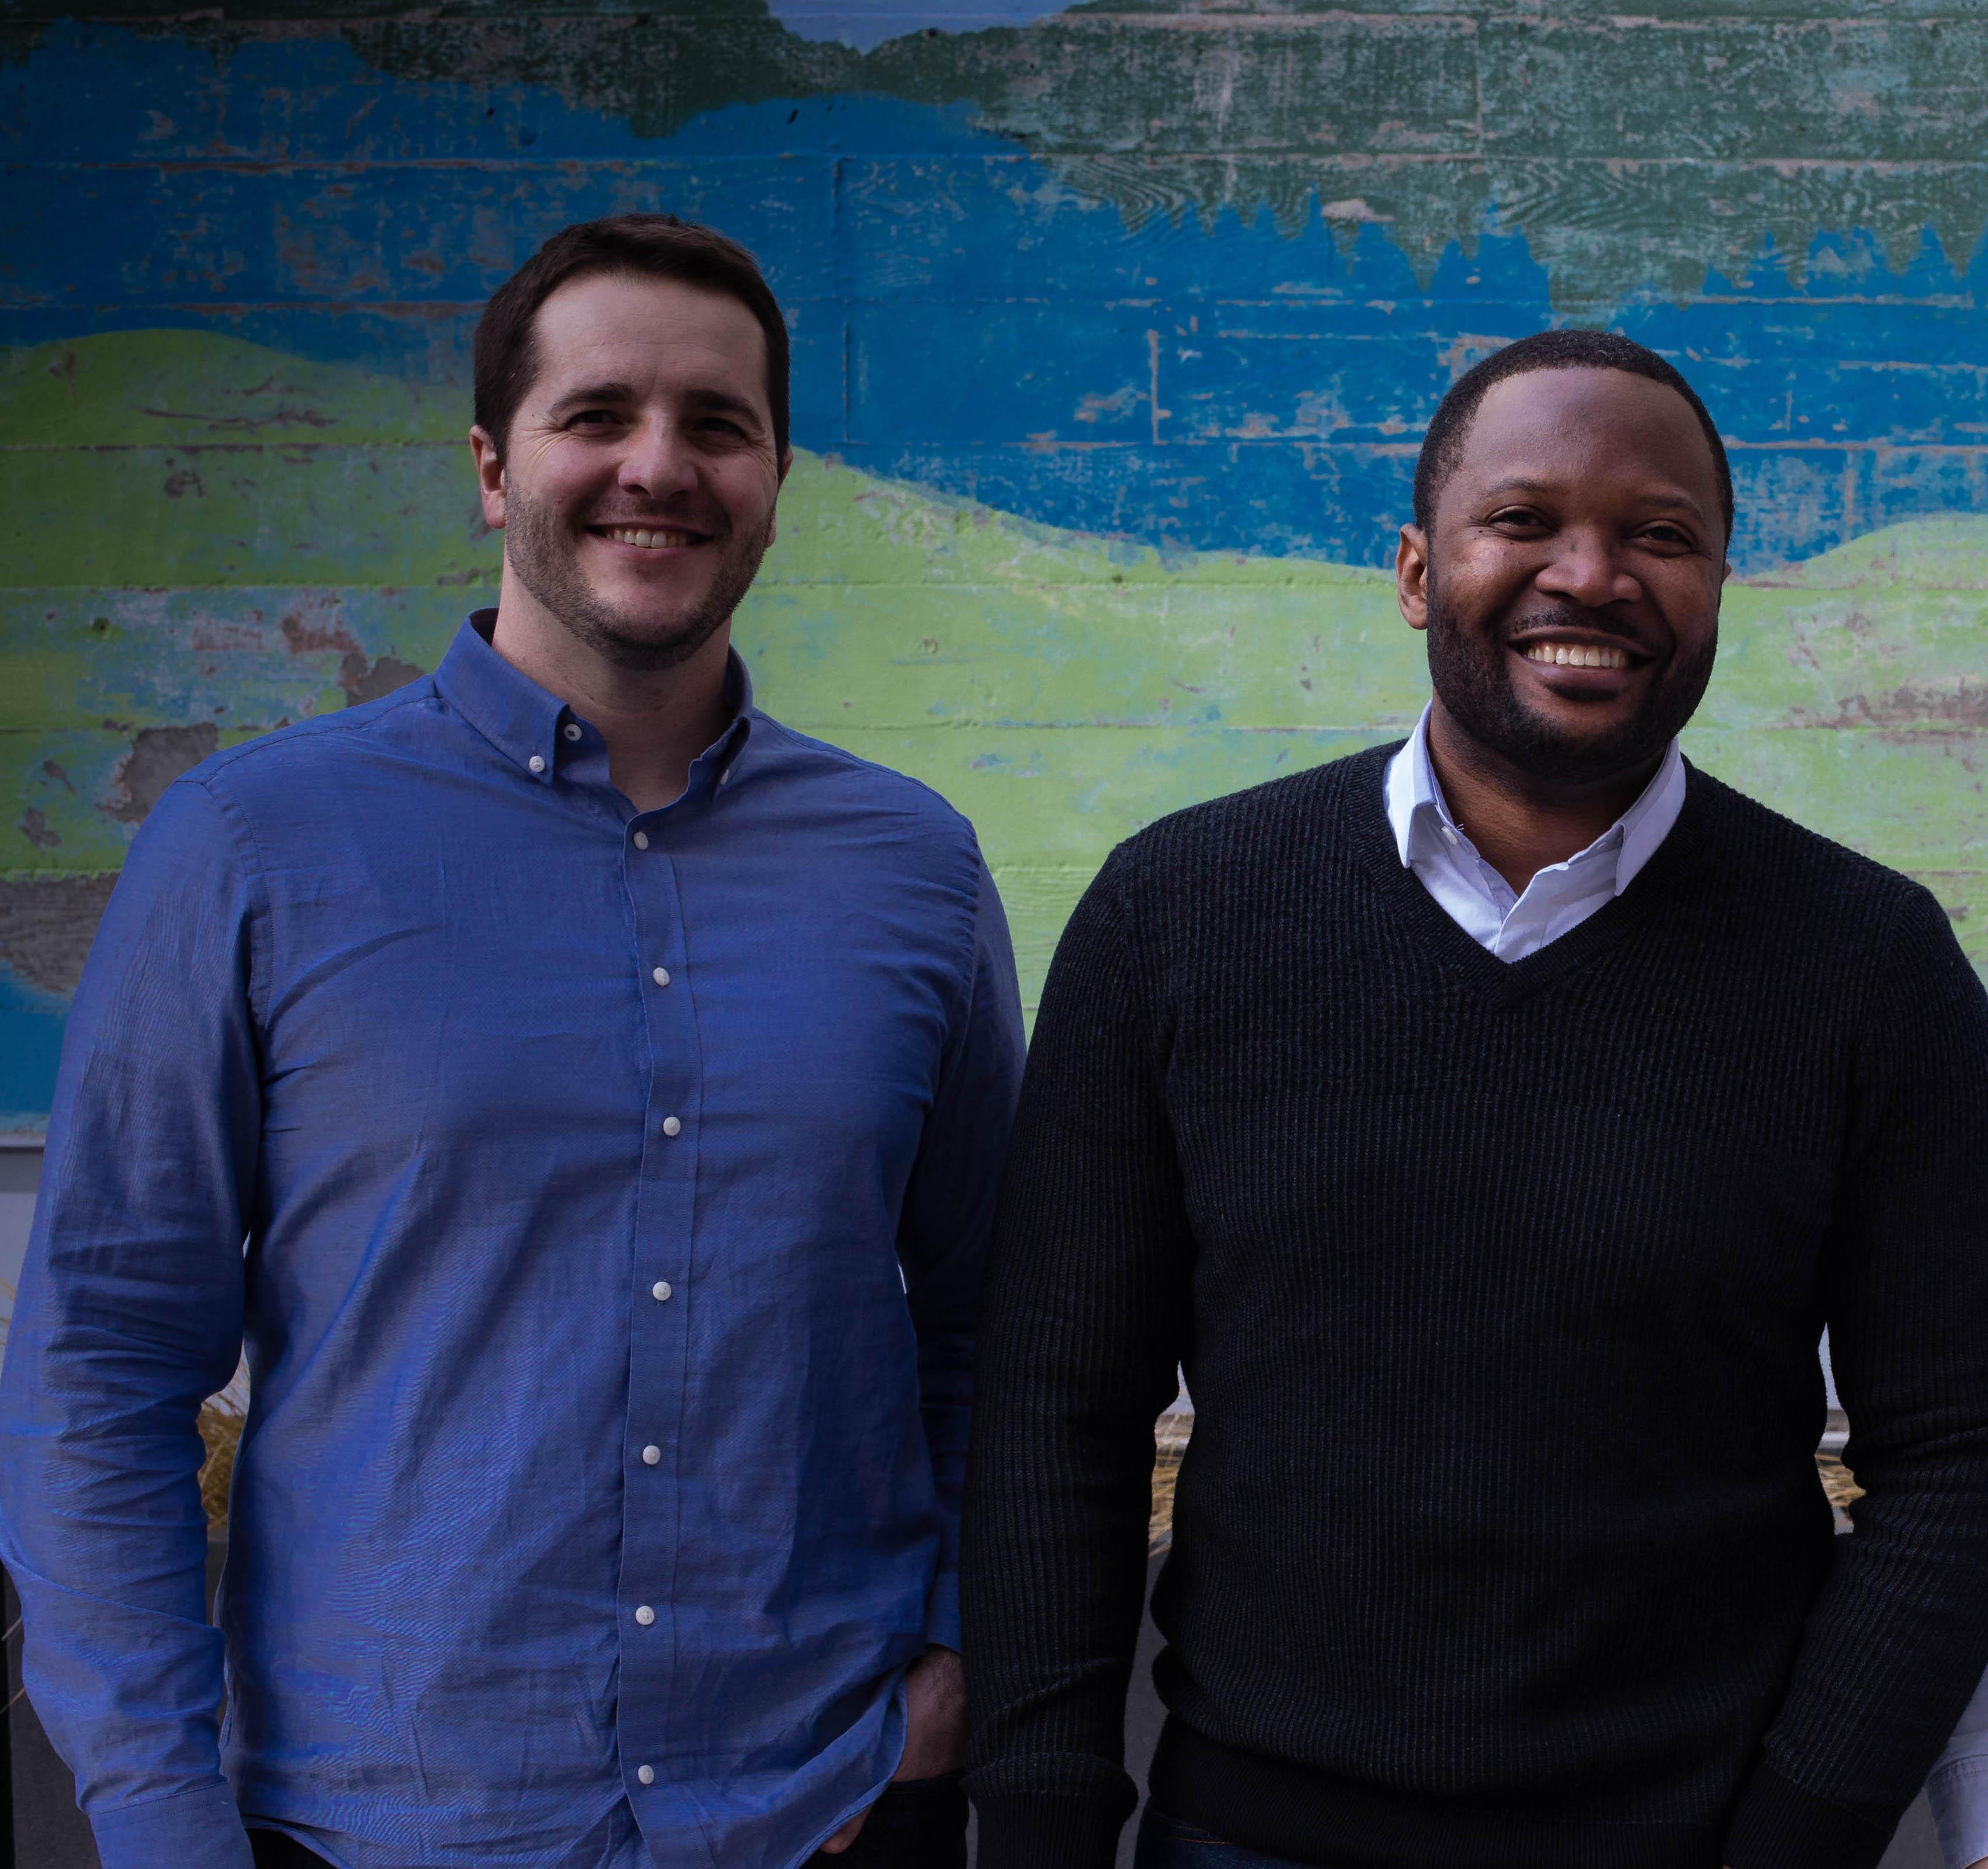 Seattle health tech startup Optimize.health raises $15.6M for remote patient monitoring service